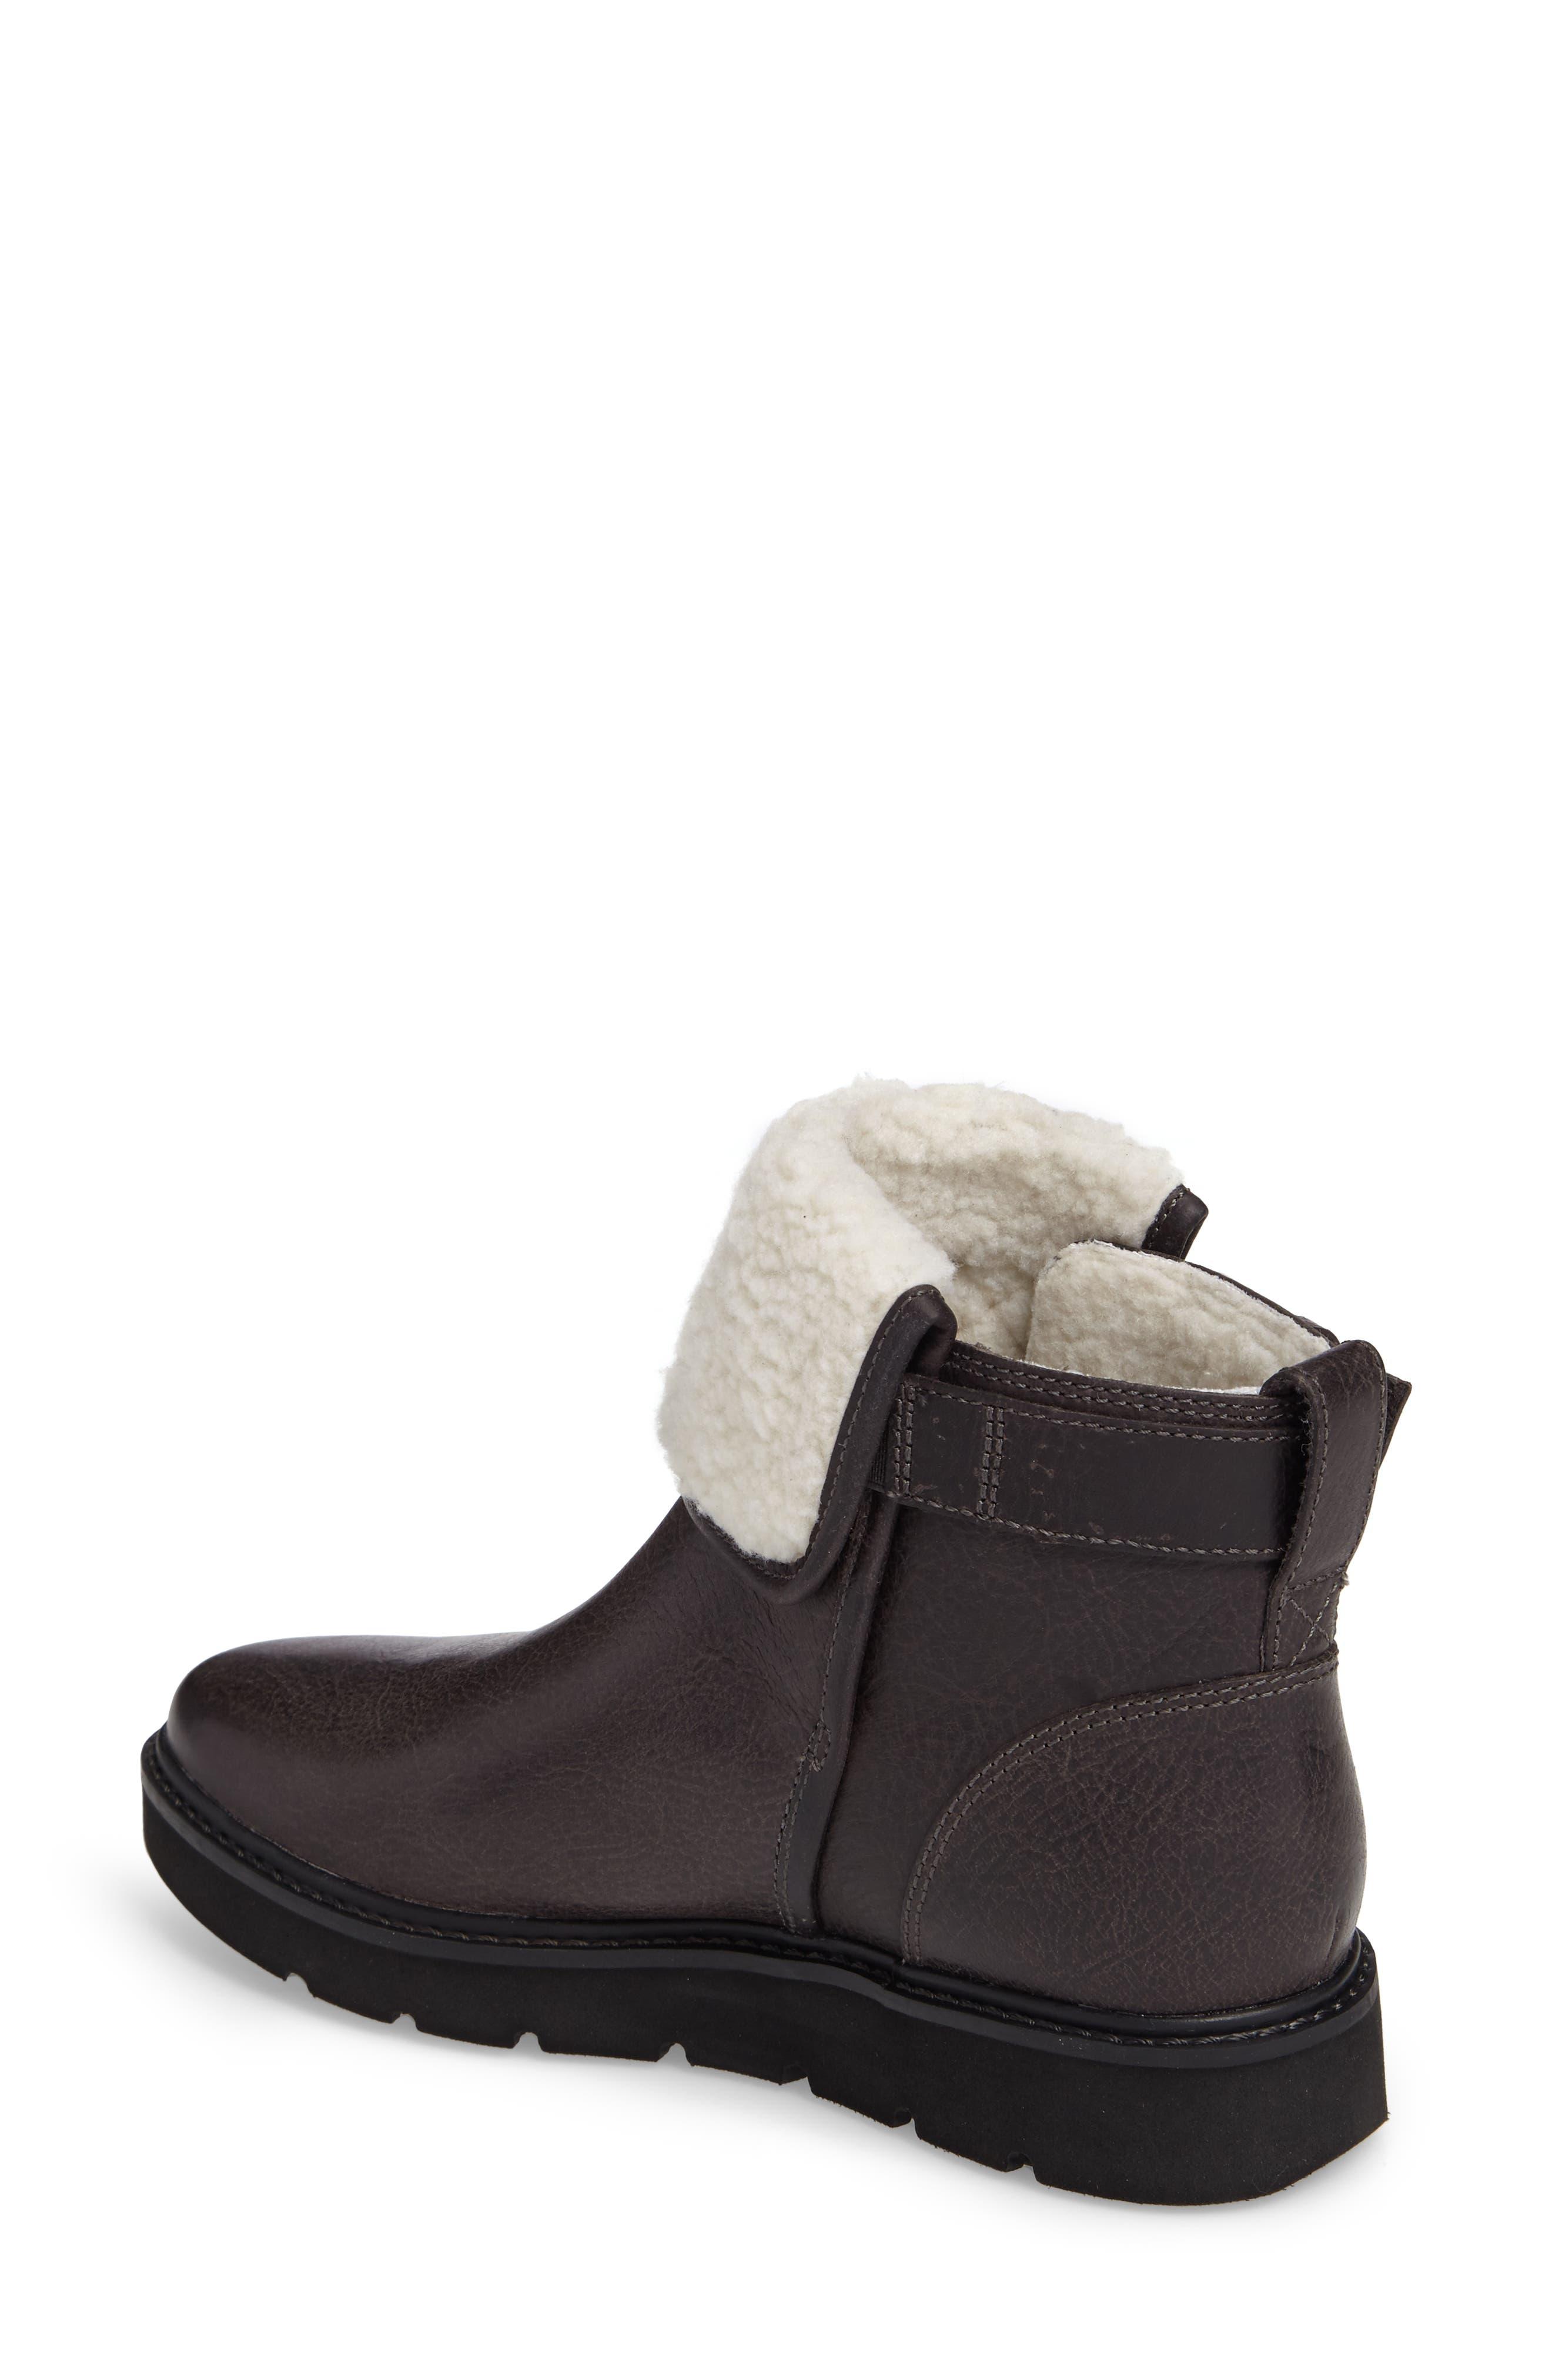 Kenniston Fleece Lined Boot,                             Alternate thumbnail 2, color,                             021